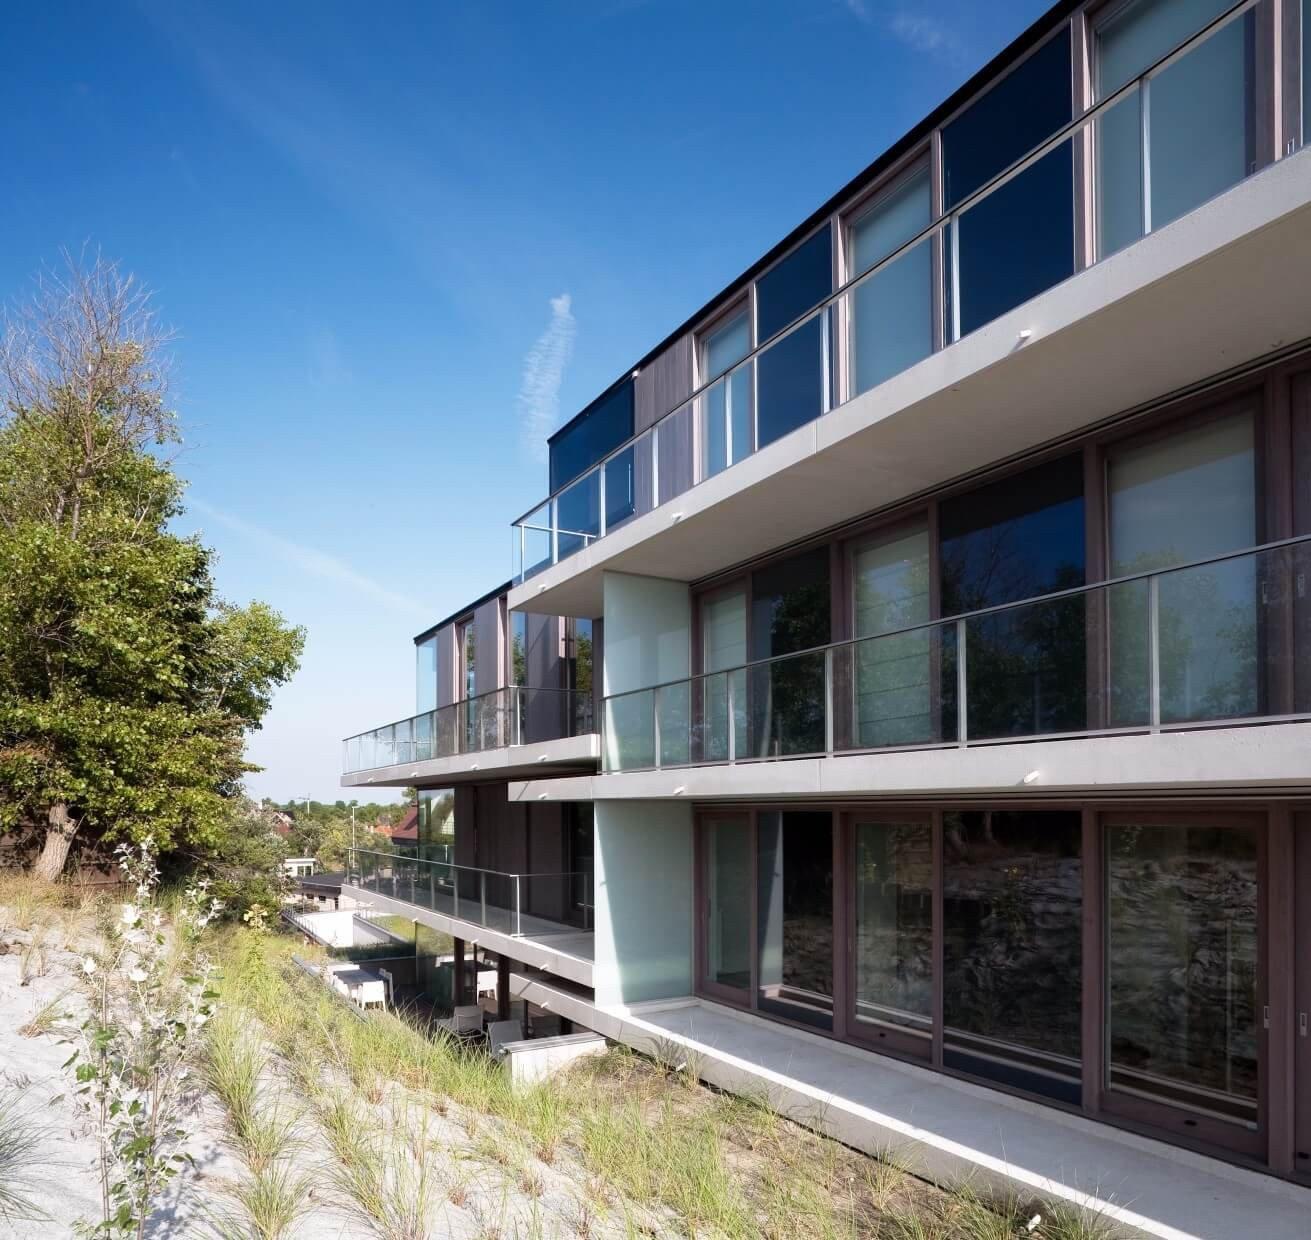 Rietveldprojects-Periscoop-appartement-design-architectuur-kust18